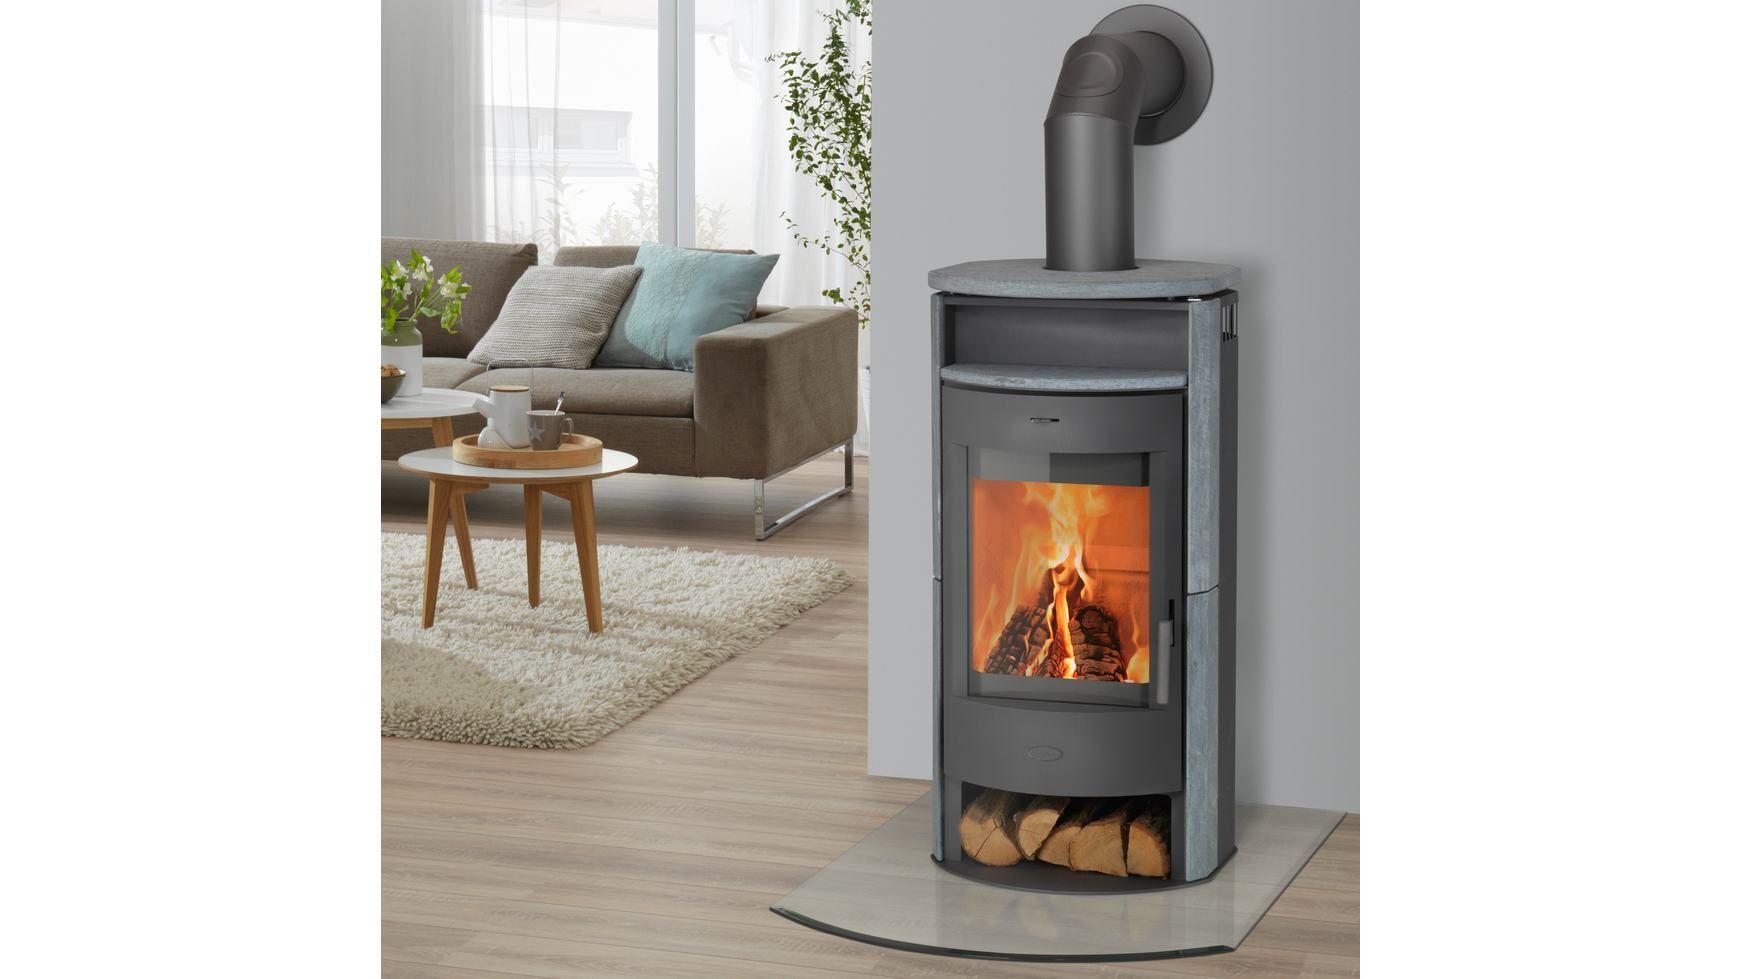 fireplace kaminofen prag naturstein 6 kw panorama sichtscheibe konvexe form kamin in grau. Black Bedroom Furniture Sets. Home Design Ideas